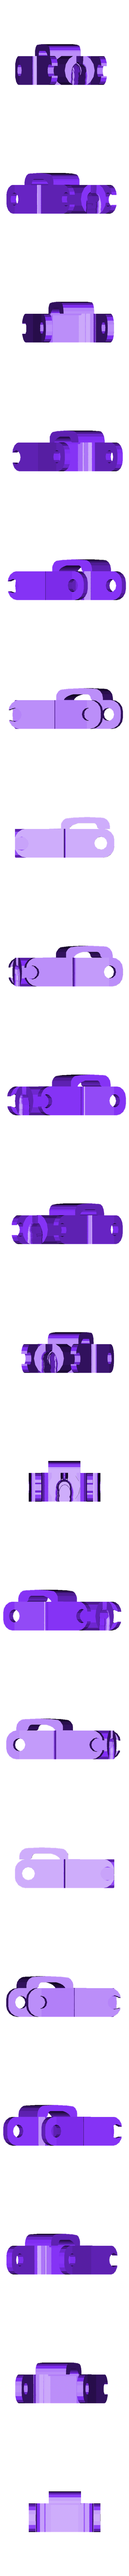 playmobil_desmontable_darth_vader_6.stl Download free STL file Darth Vader Playmobil • 3D printable object, madsoul666